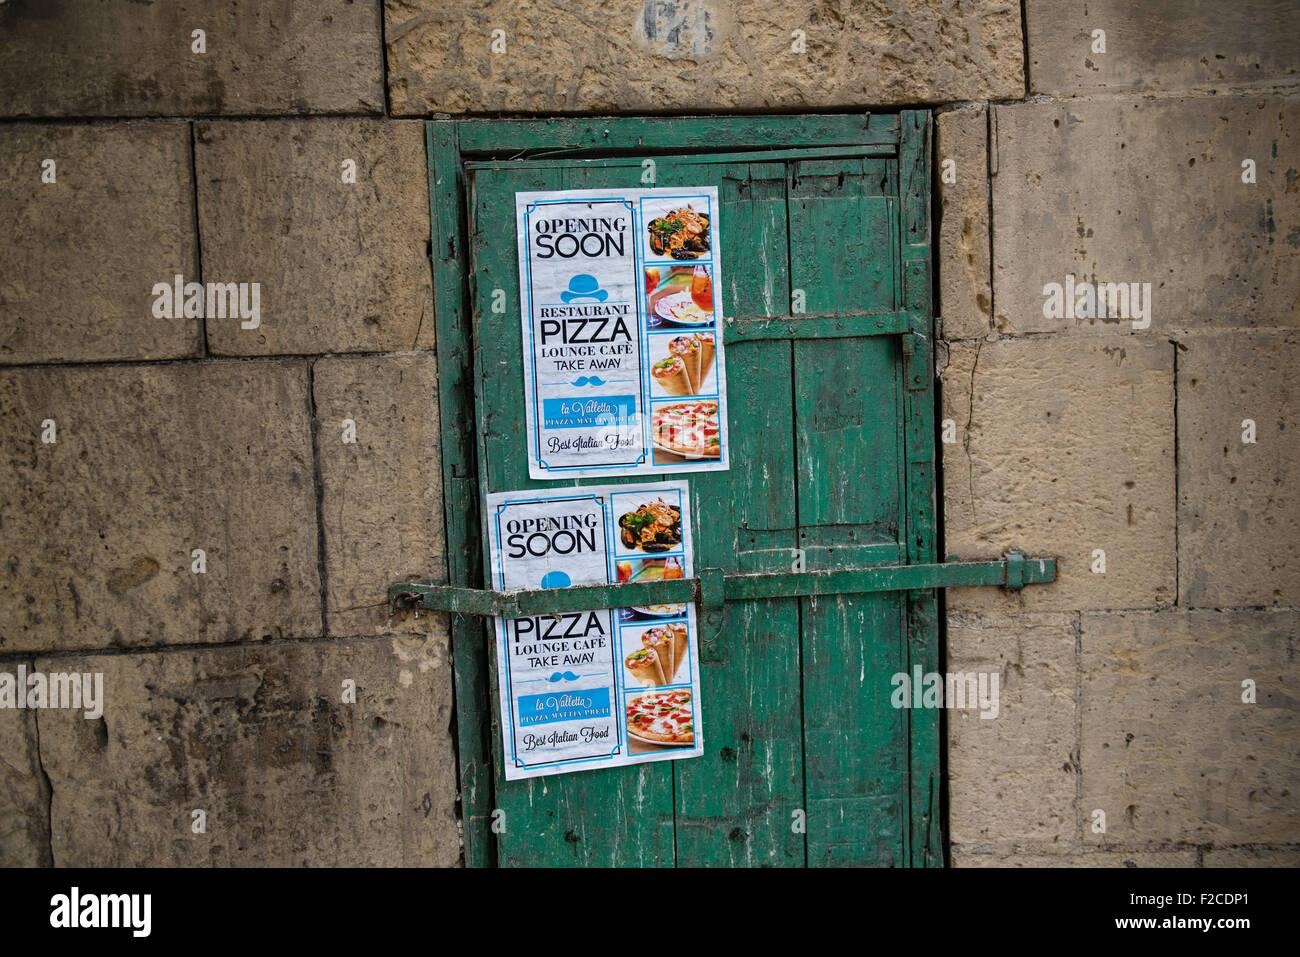 Malta, 2 january 2015  New Pizza lounge cafe opening soon.  Photo Kees Metselaar - Stock Image